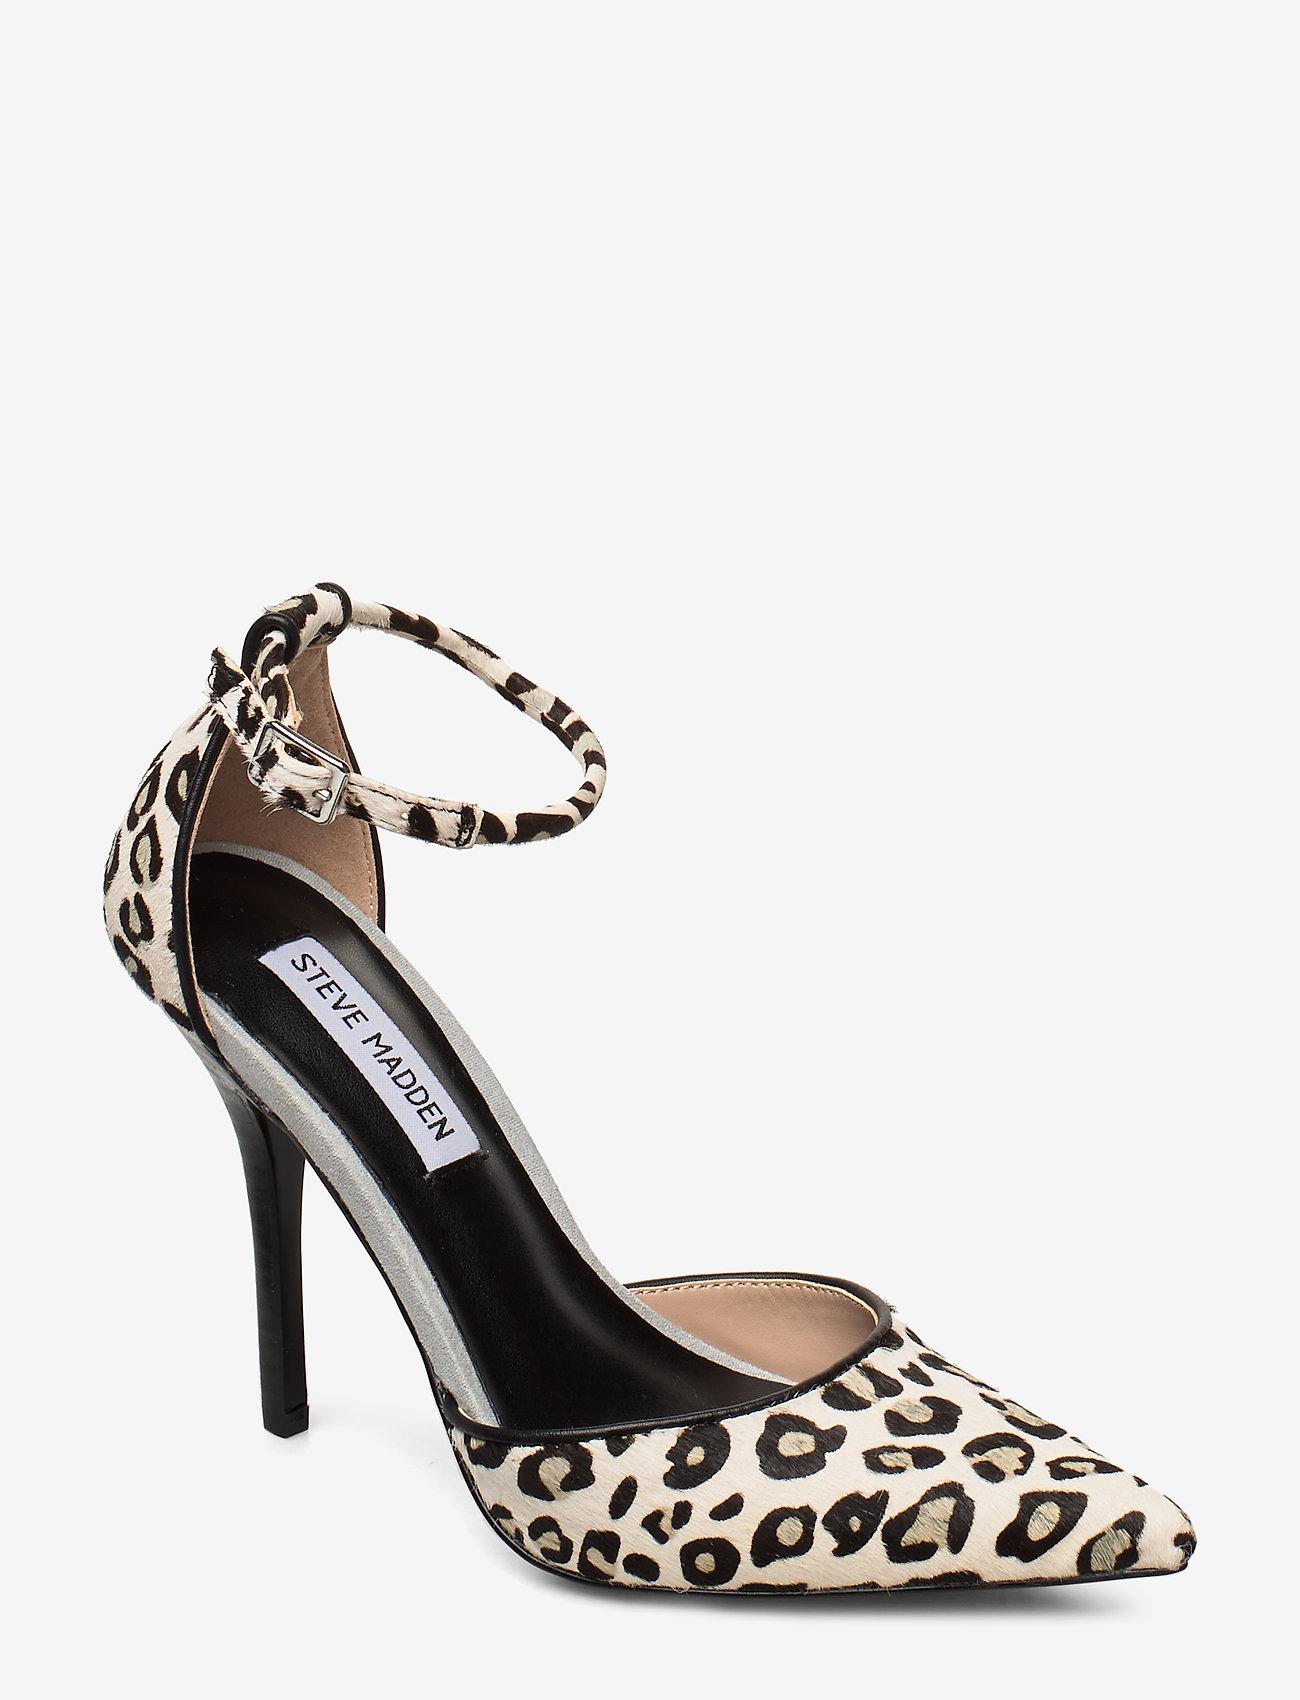 Adelle-l Heel (Snow Leopard) (65.99